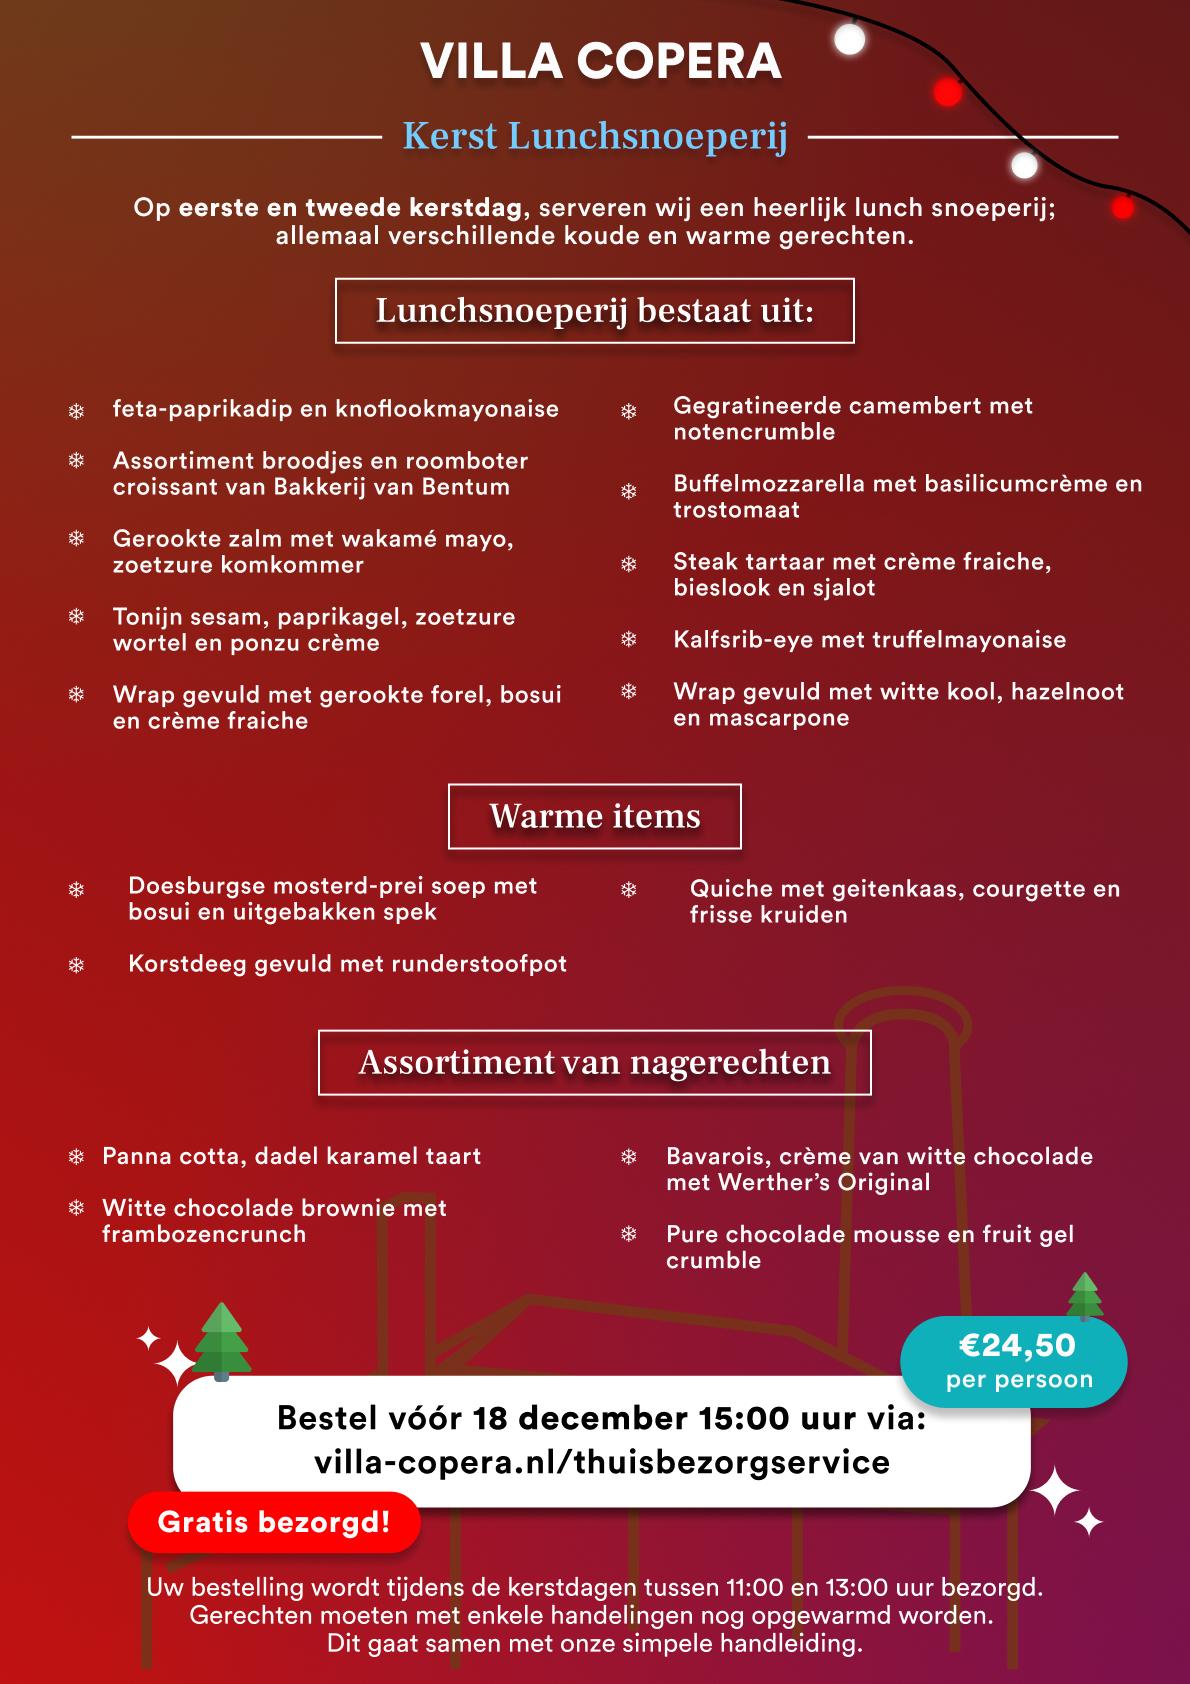 Villa Copera - Thuisbezorgservice - Kerst Lunchproeverij